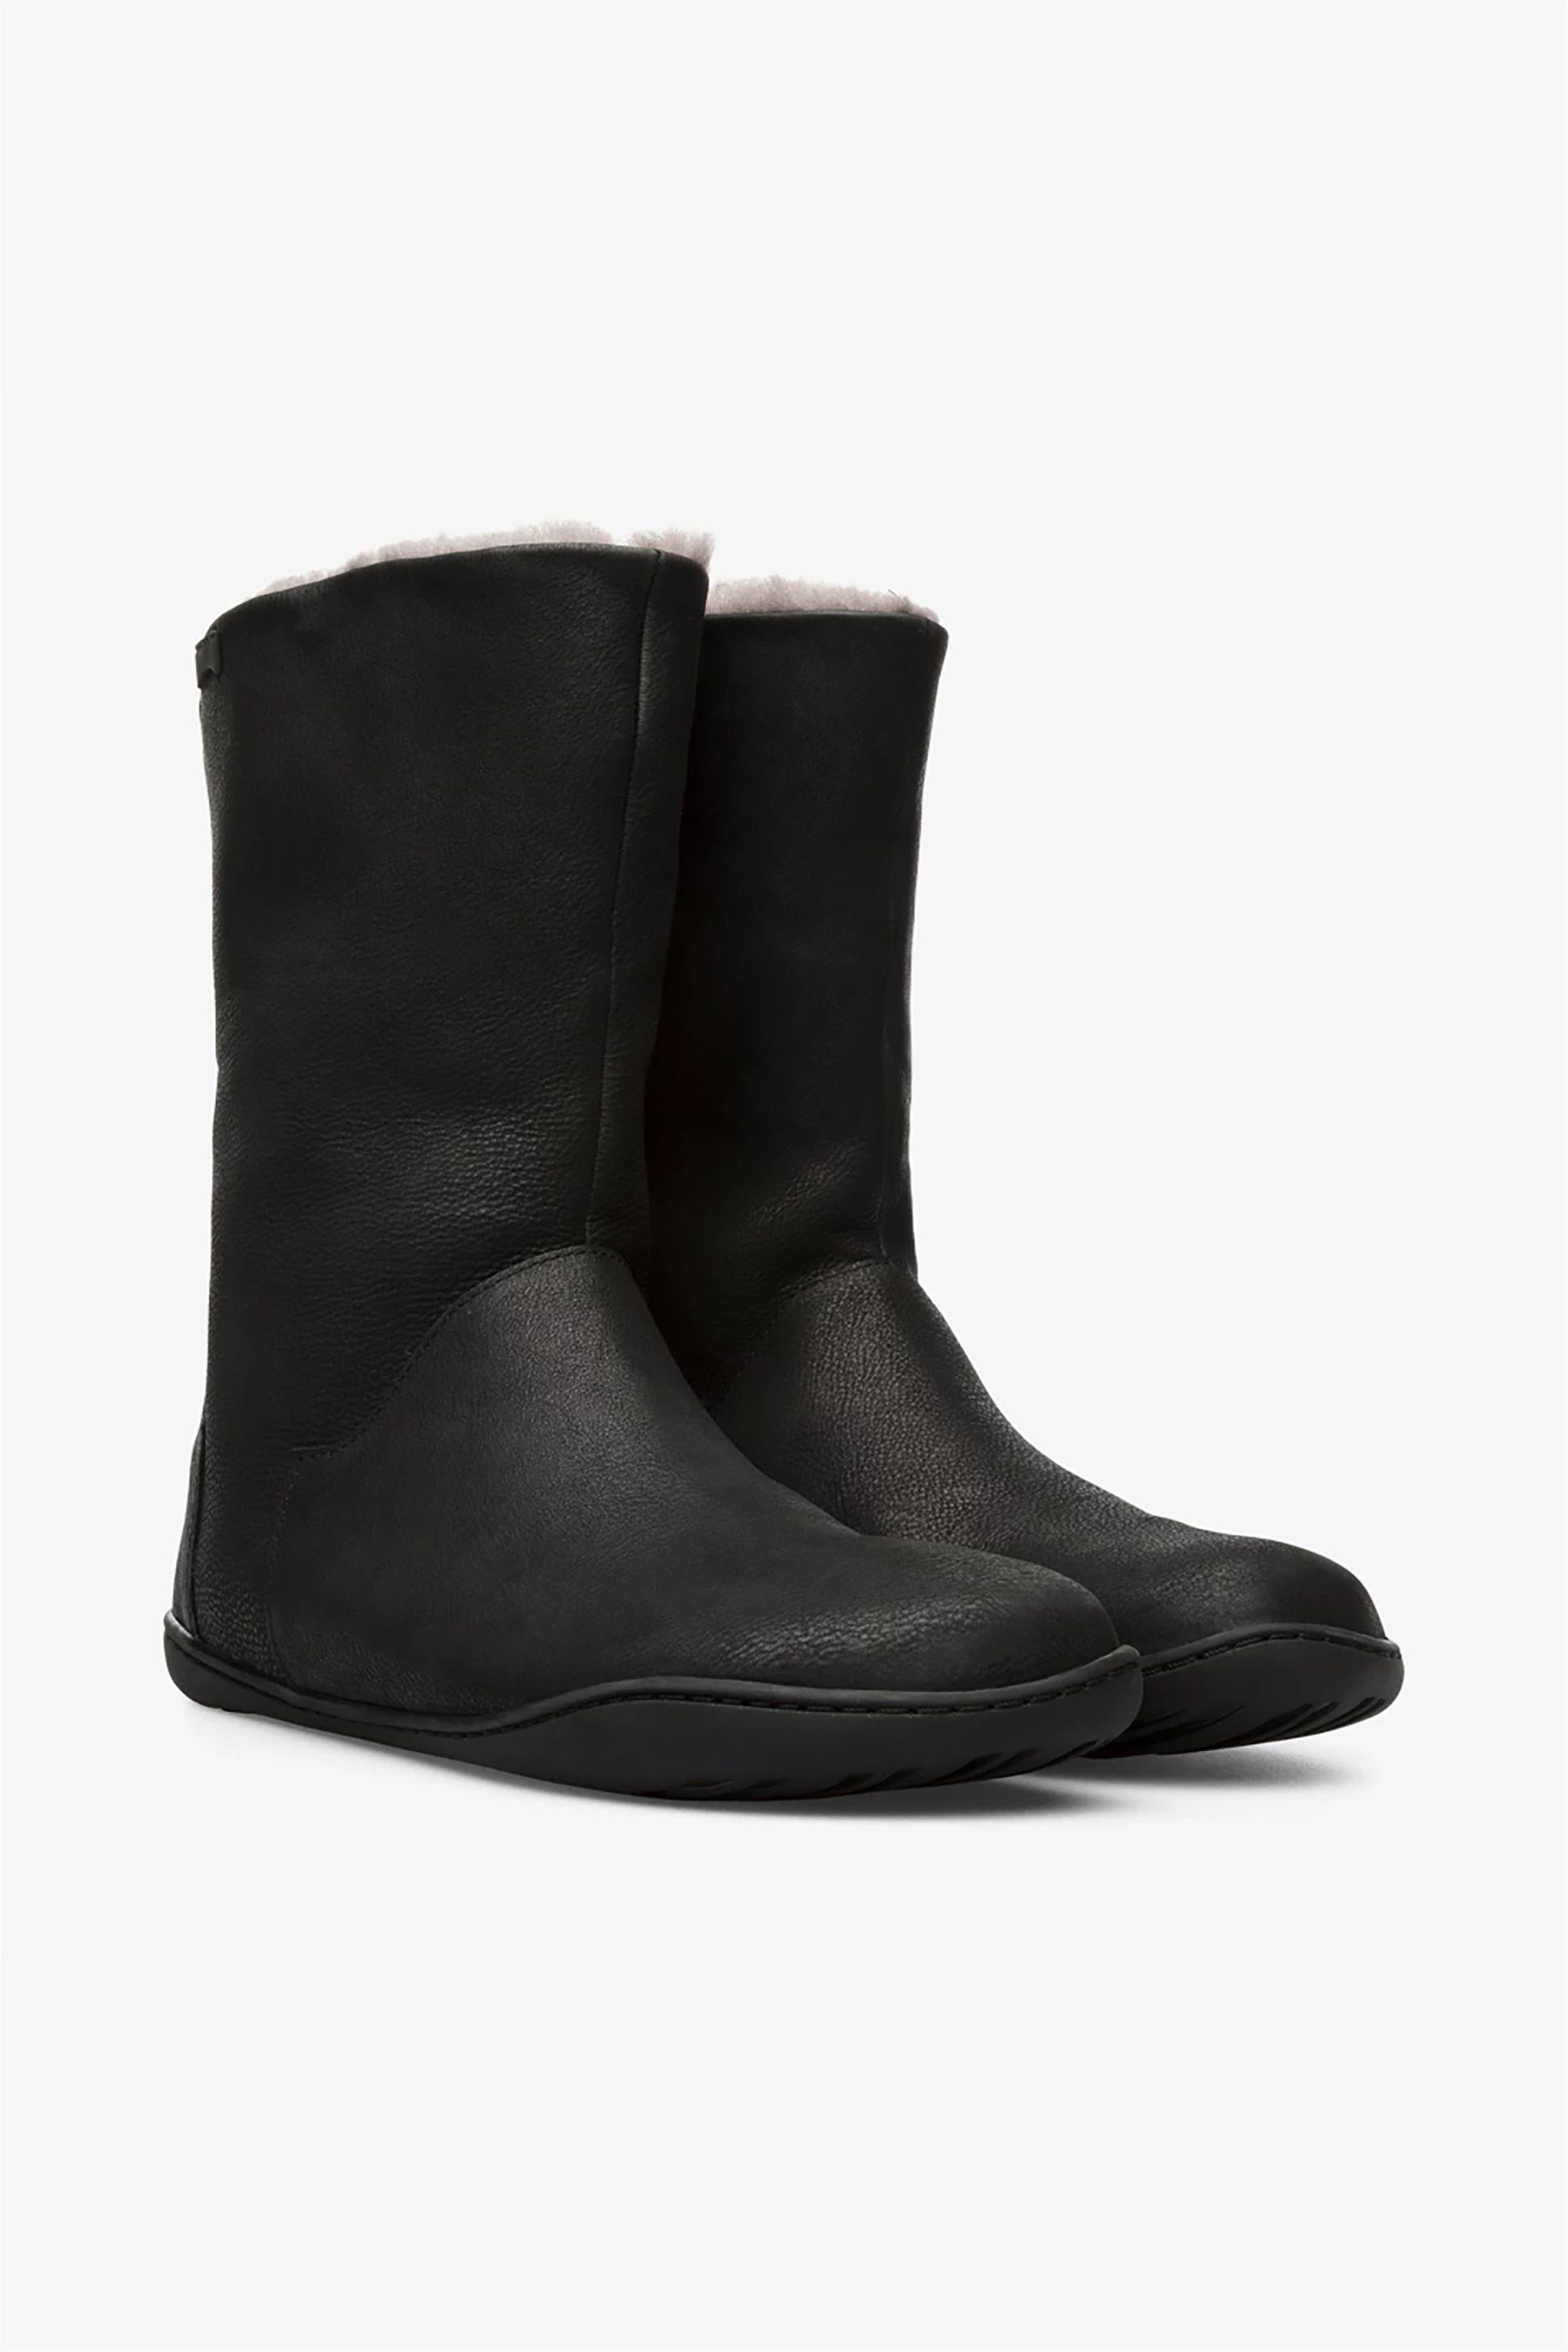 Camper γυναικείες μπότες με γούνινη επένδυση «Peu» – K400295-004 – Μαύρο